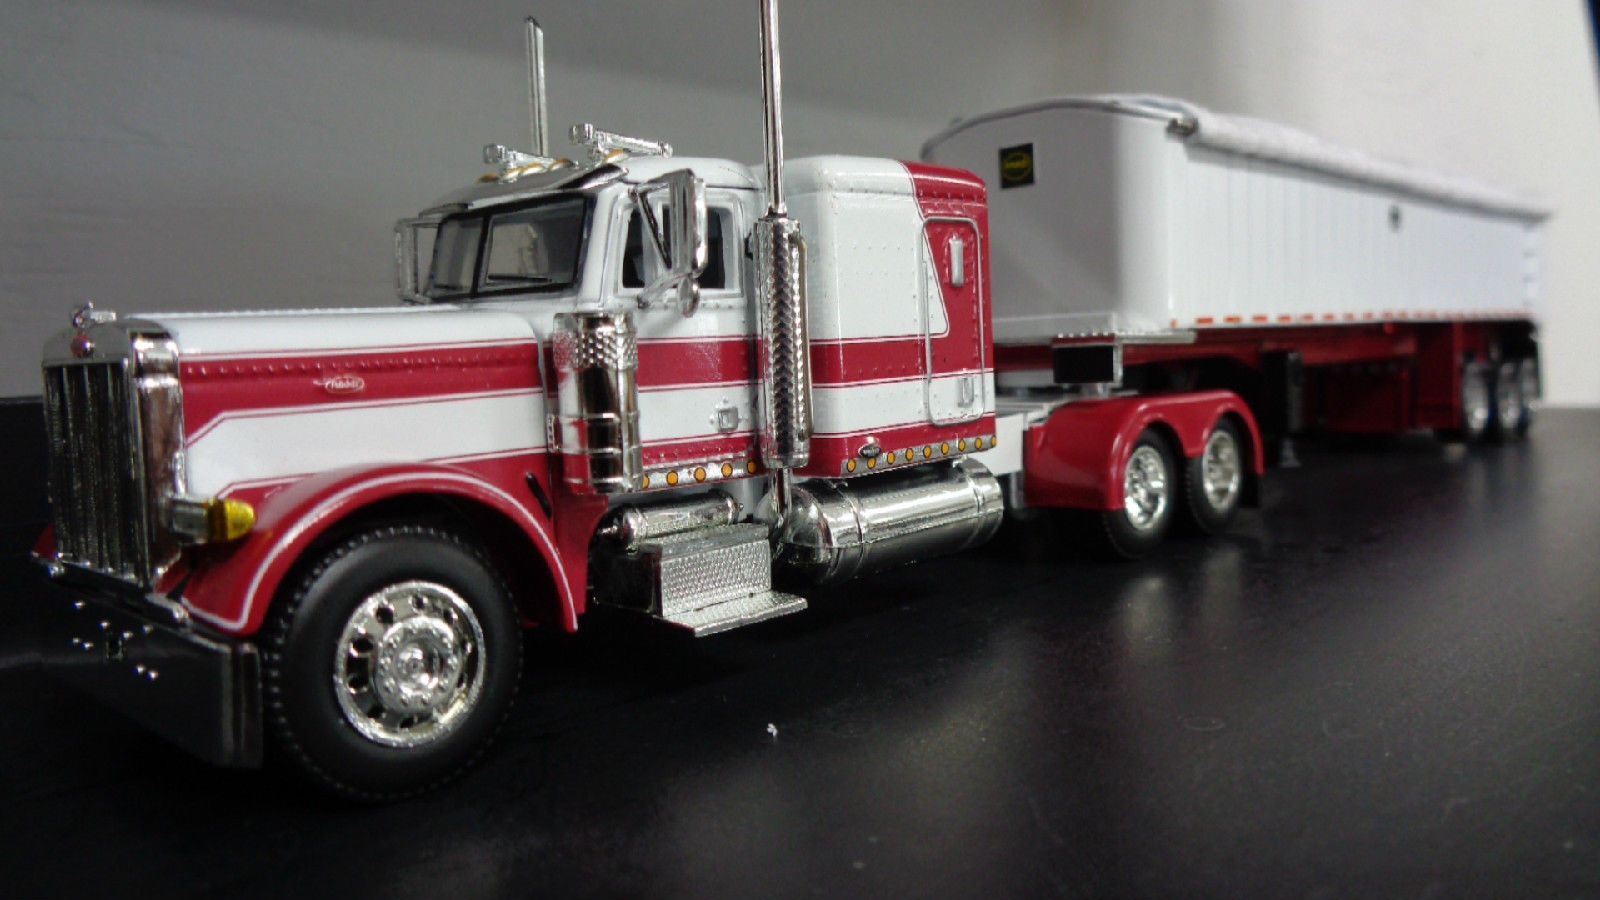 1 64 scale trucks and trailers - 1 64 Scale Dcp 33076 Peterbilt 379 Mac Coal Trailer New Cummings